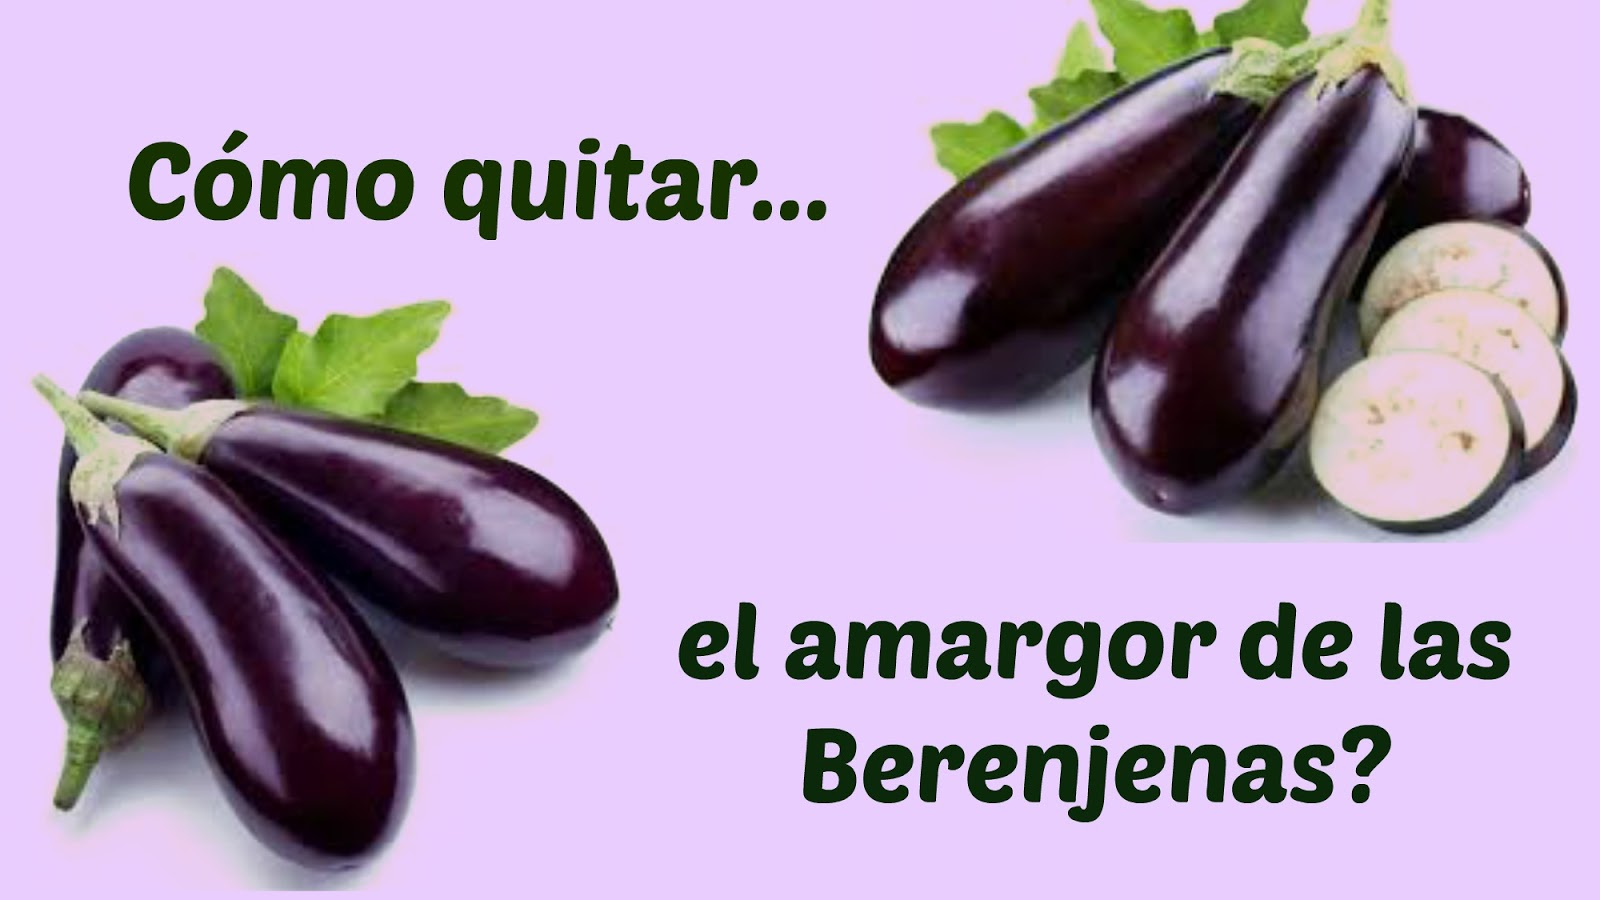 beautyfoodbody consejo tip quitar amargor berenjenas